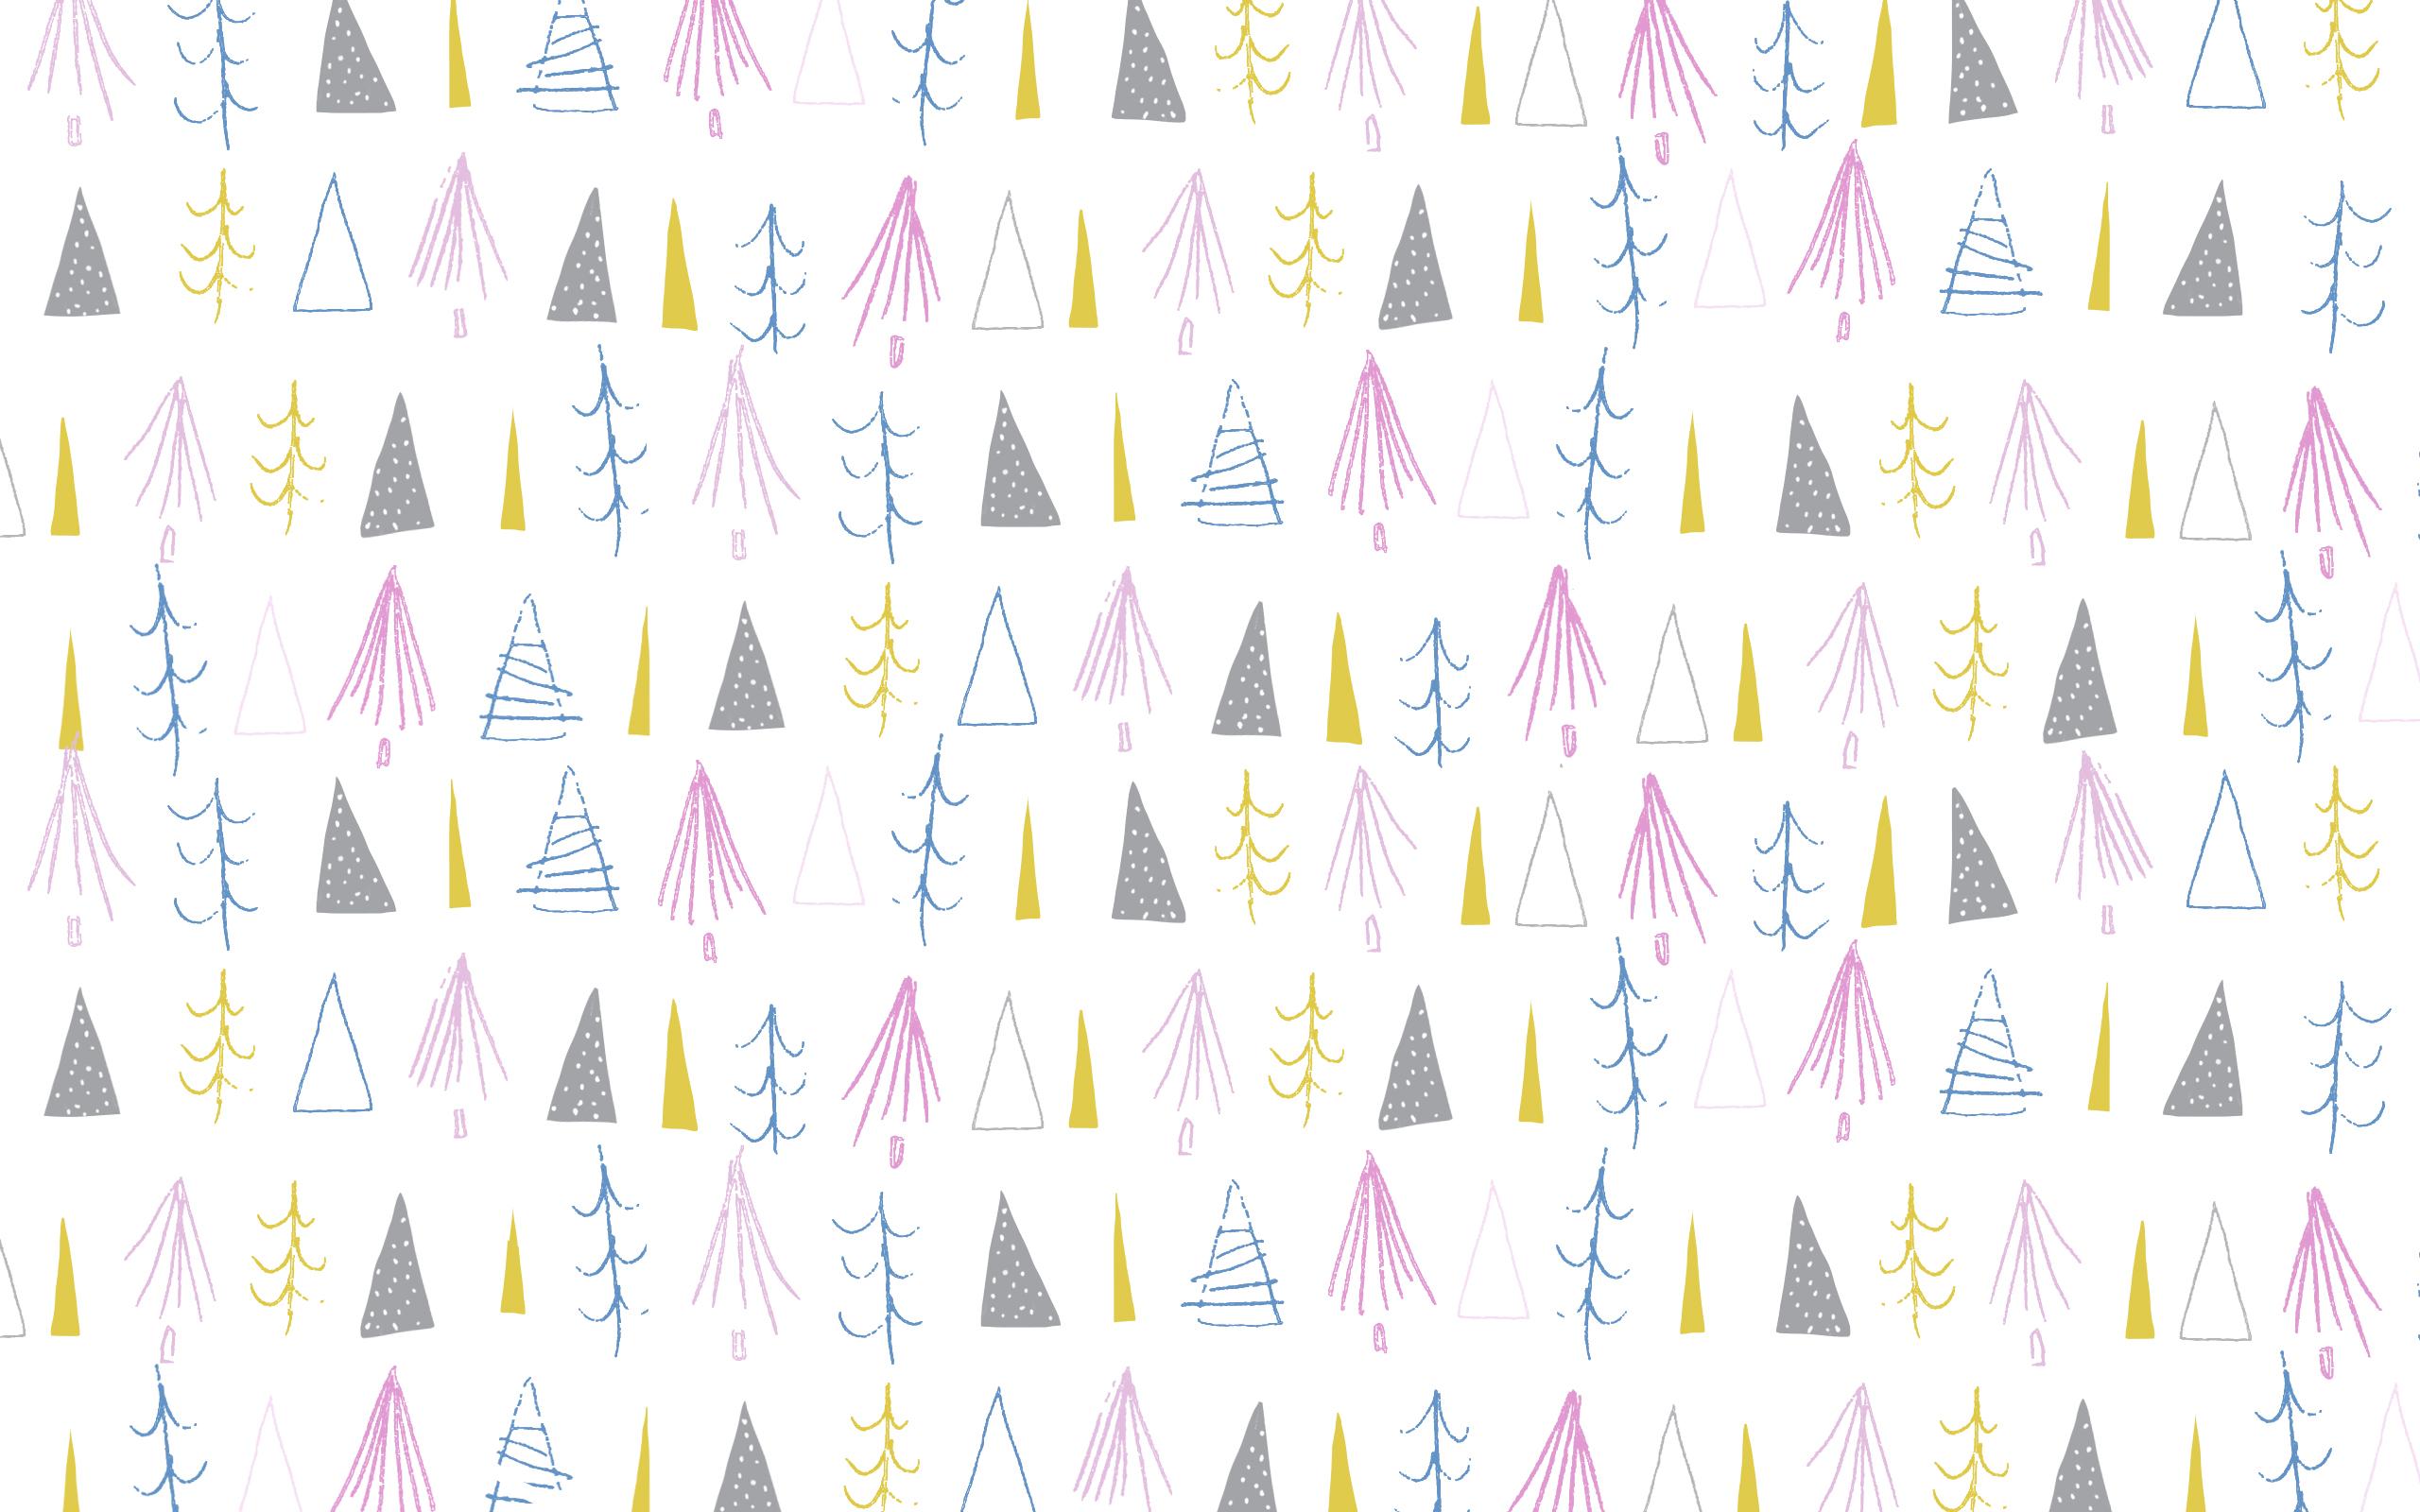 festive wallpaper 2